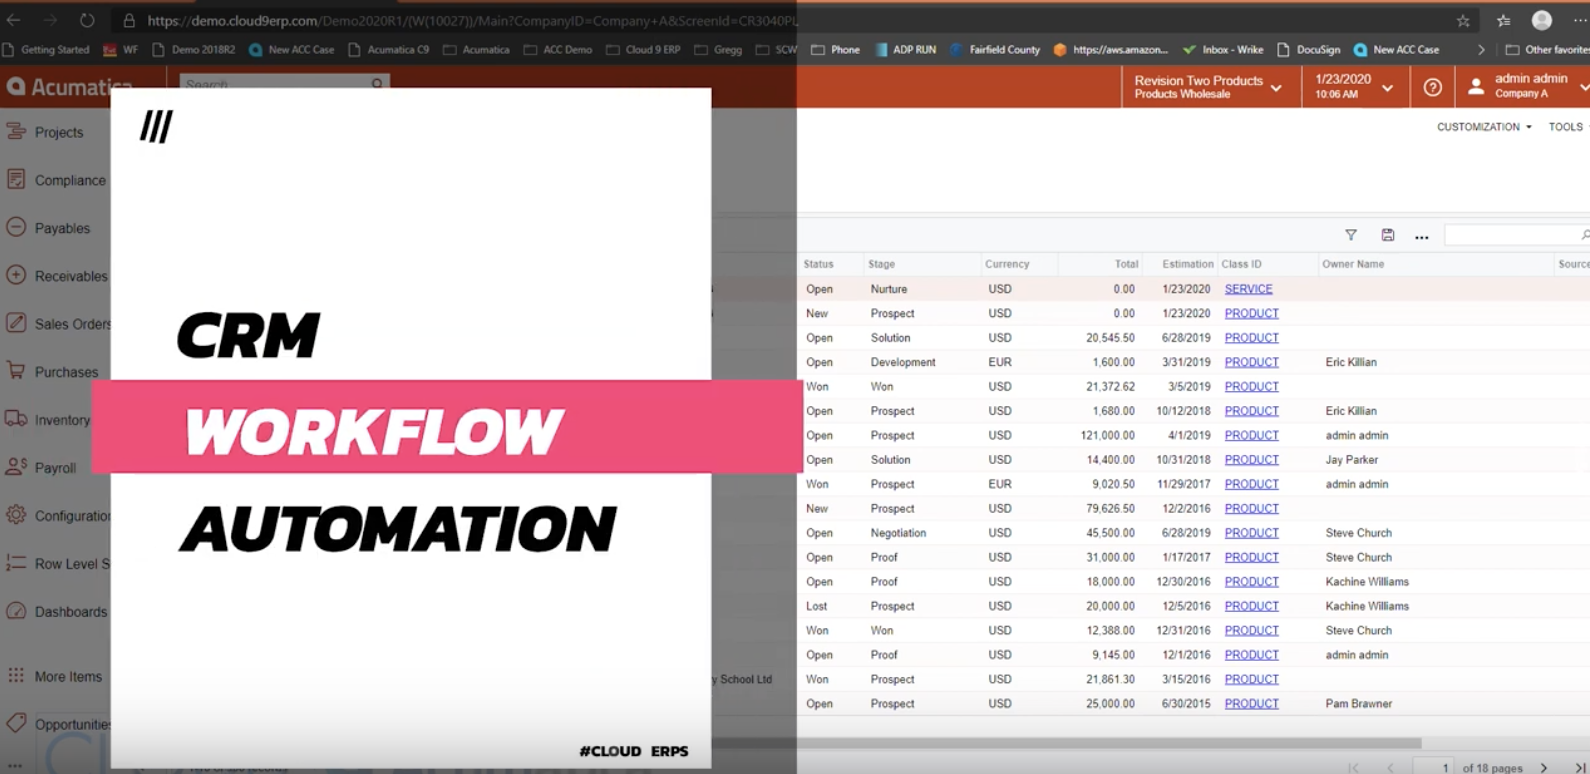 Acumatica-2020-R1-CRM-Workflow-Automation